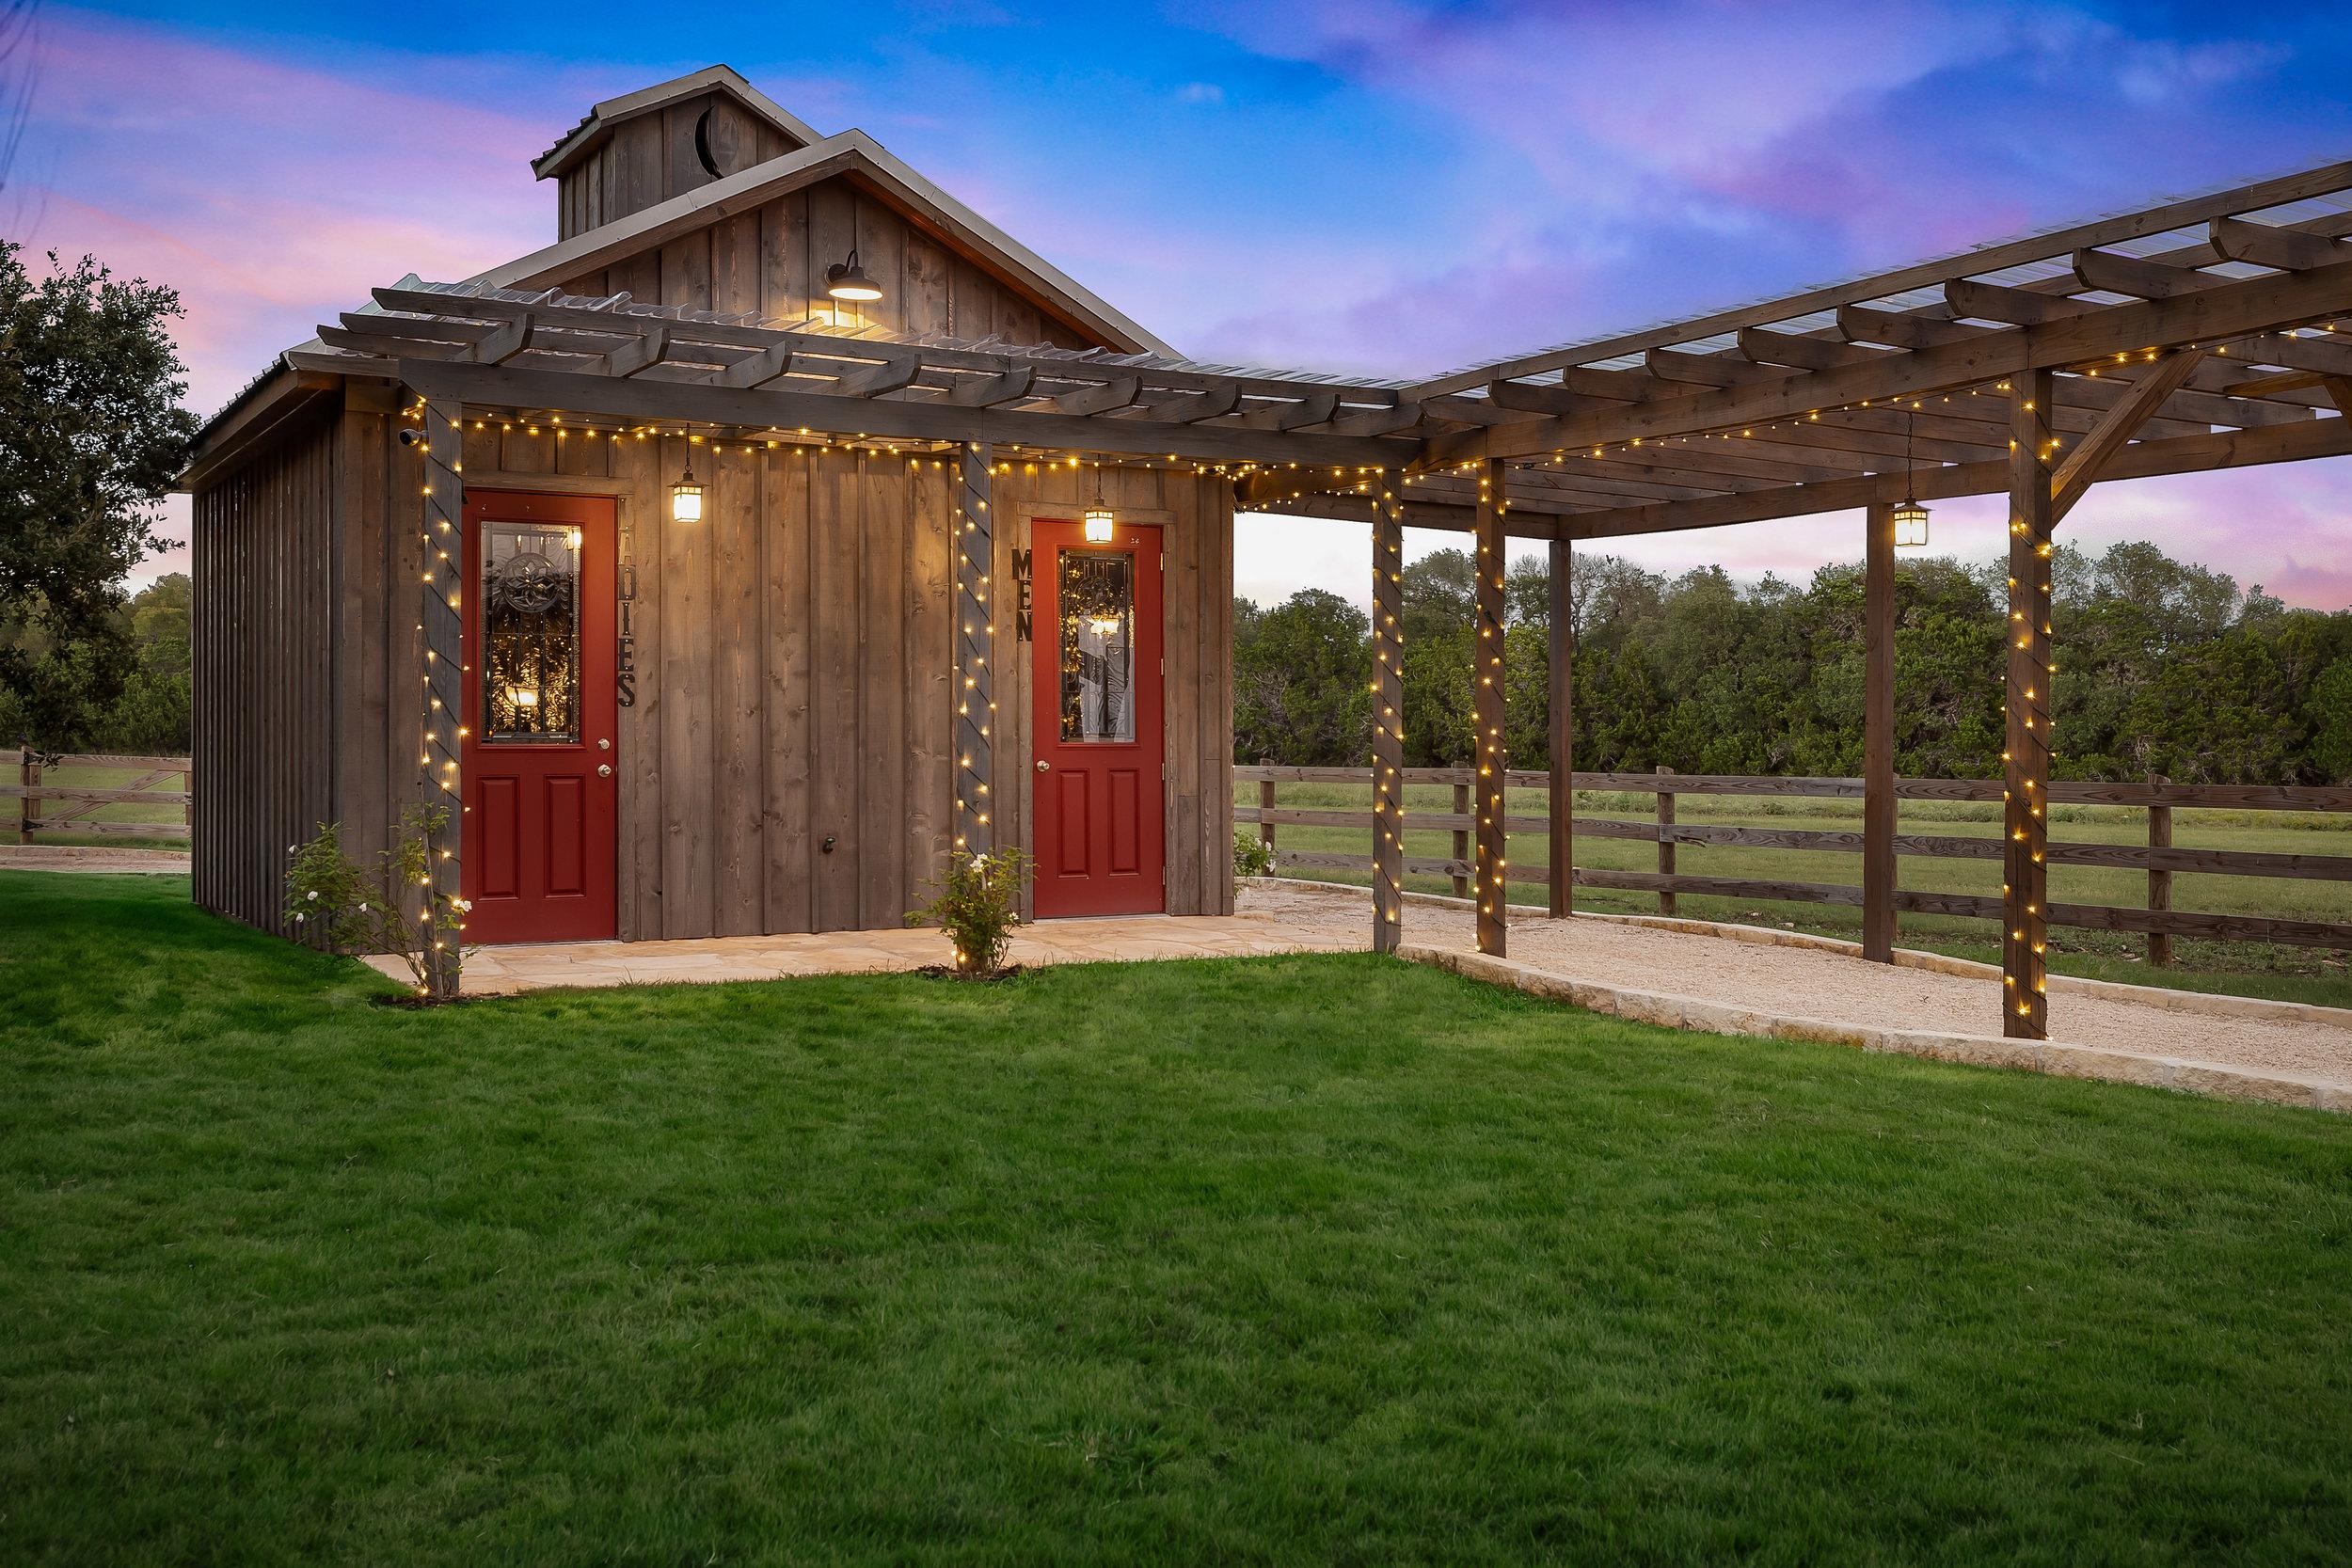 2018-08-31 Megan Parsons - Shooting Star Ranch (Screen-Res) (31 of 32).jpg